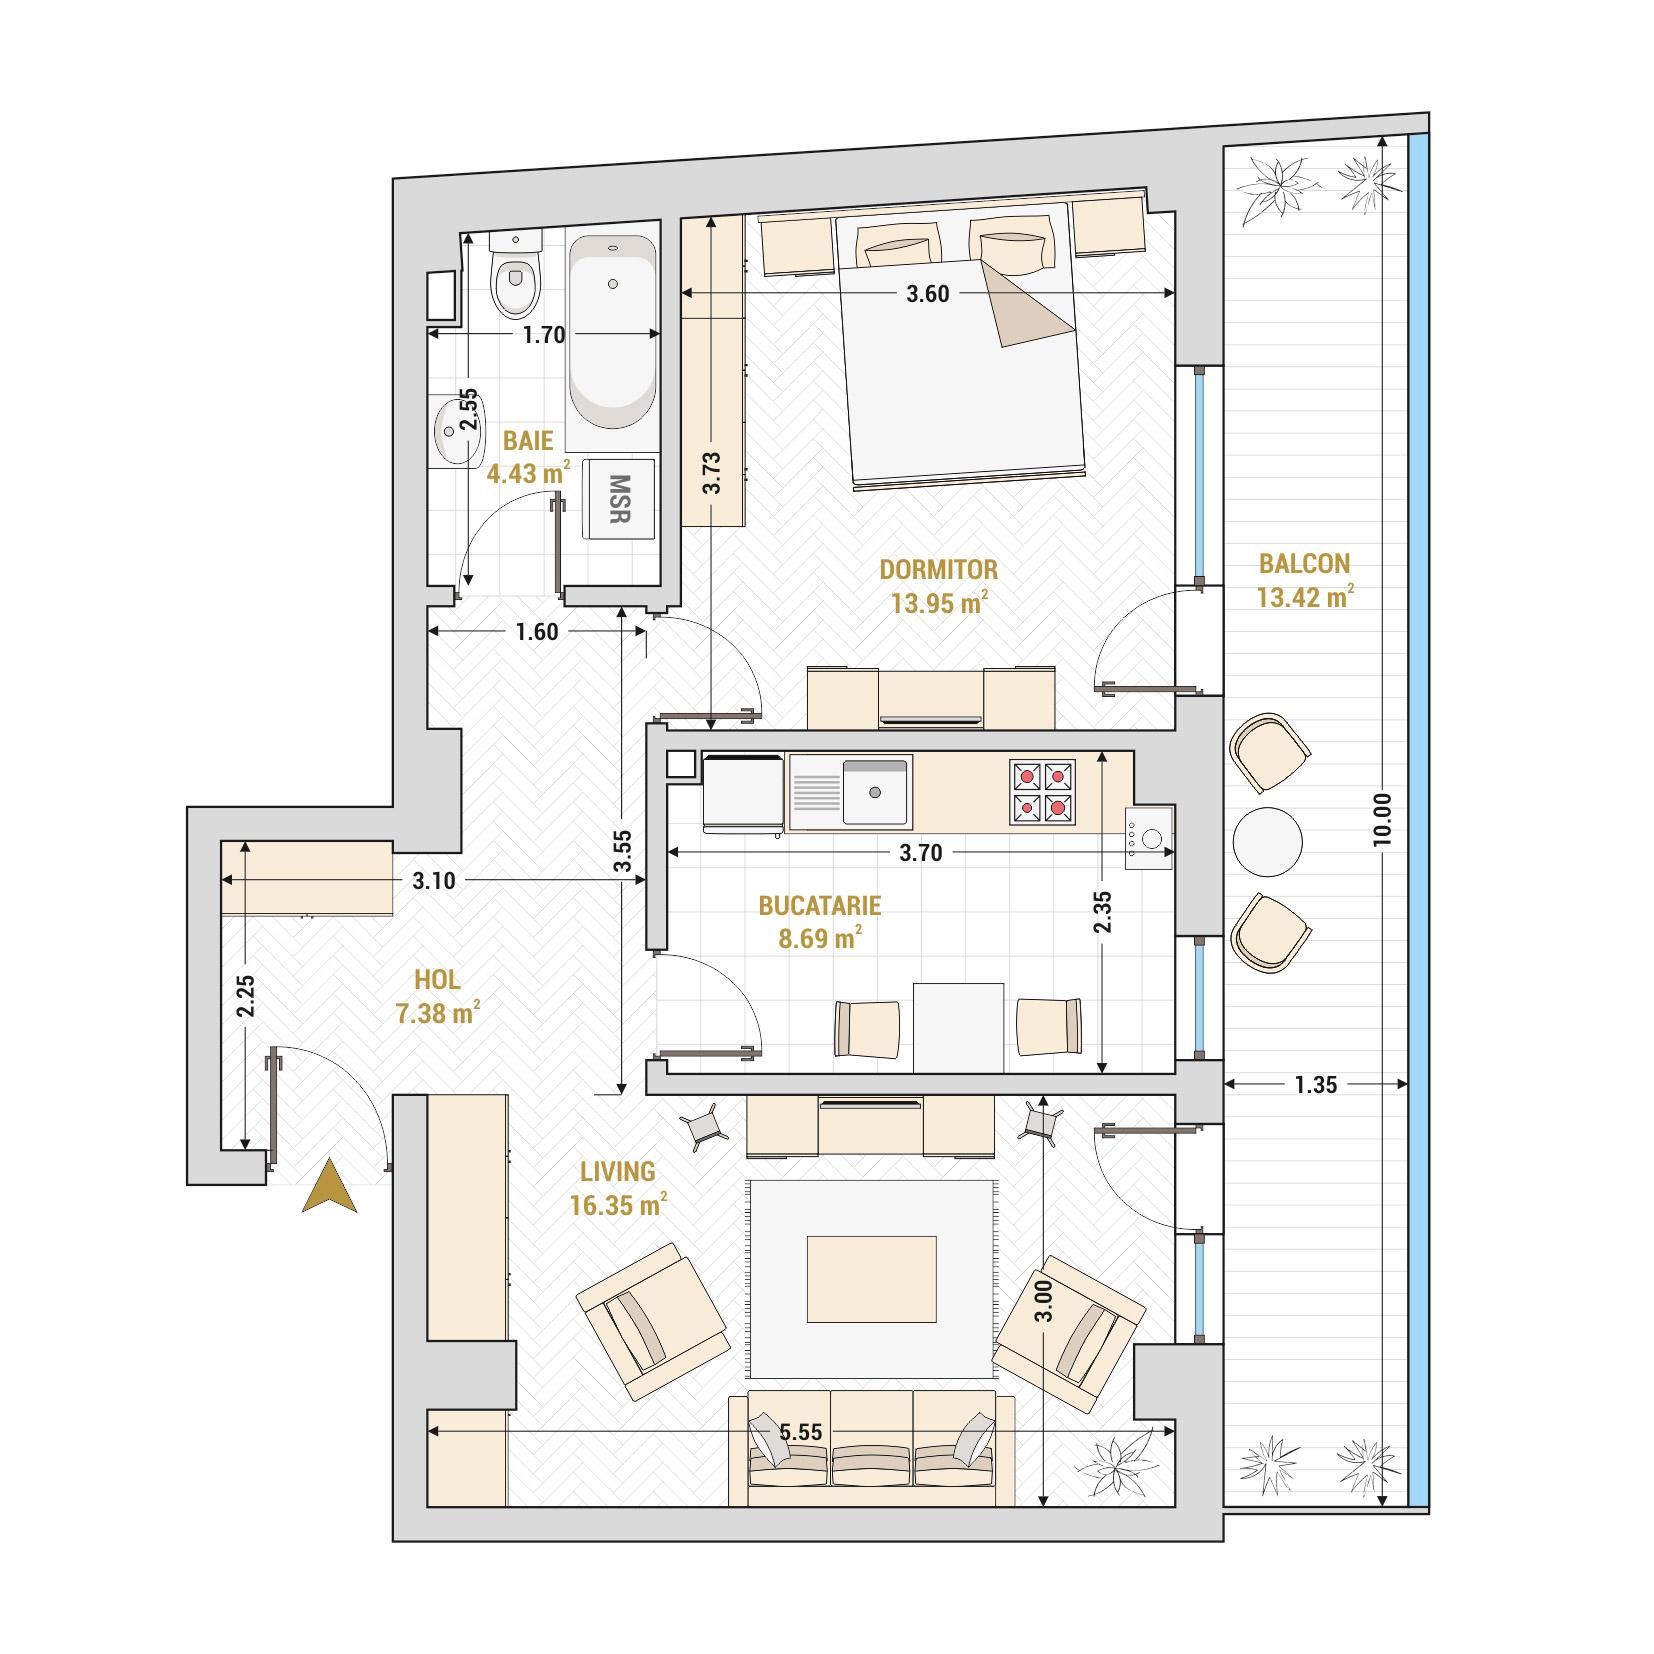 Apartament 2 camere de vanzare Bucuresti - Catedral Residence - Marriott, Piata Unirii, 13 Septembrie, Izvor - Tip 3 - T2